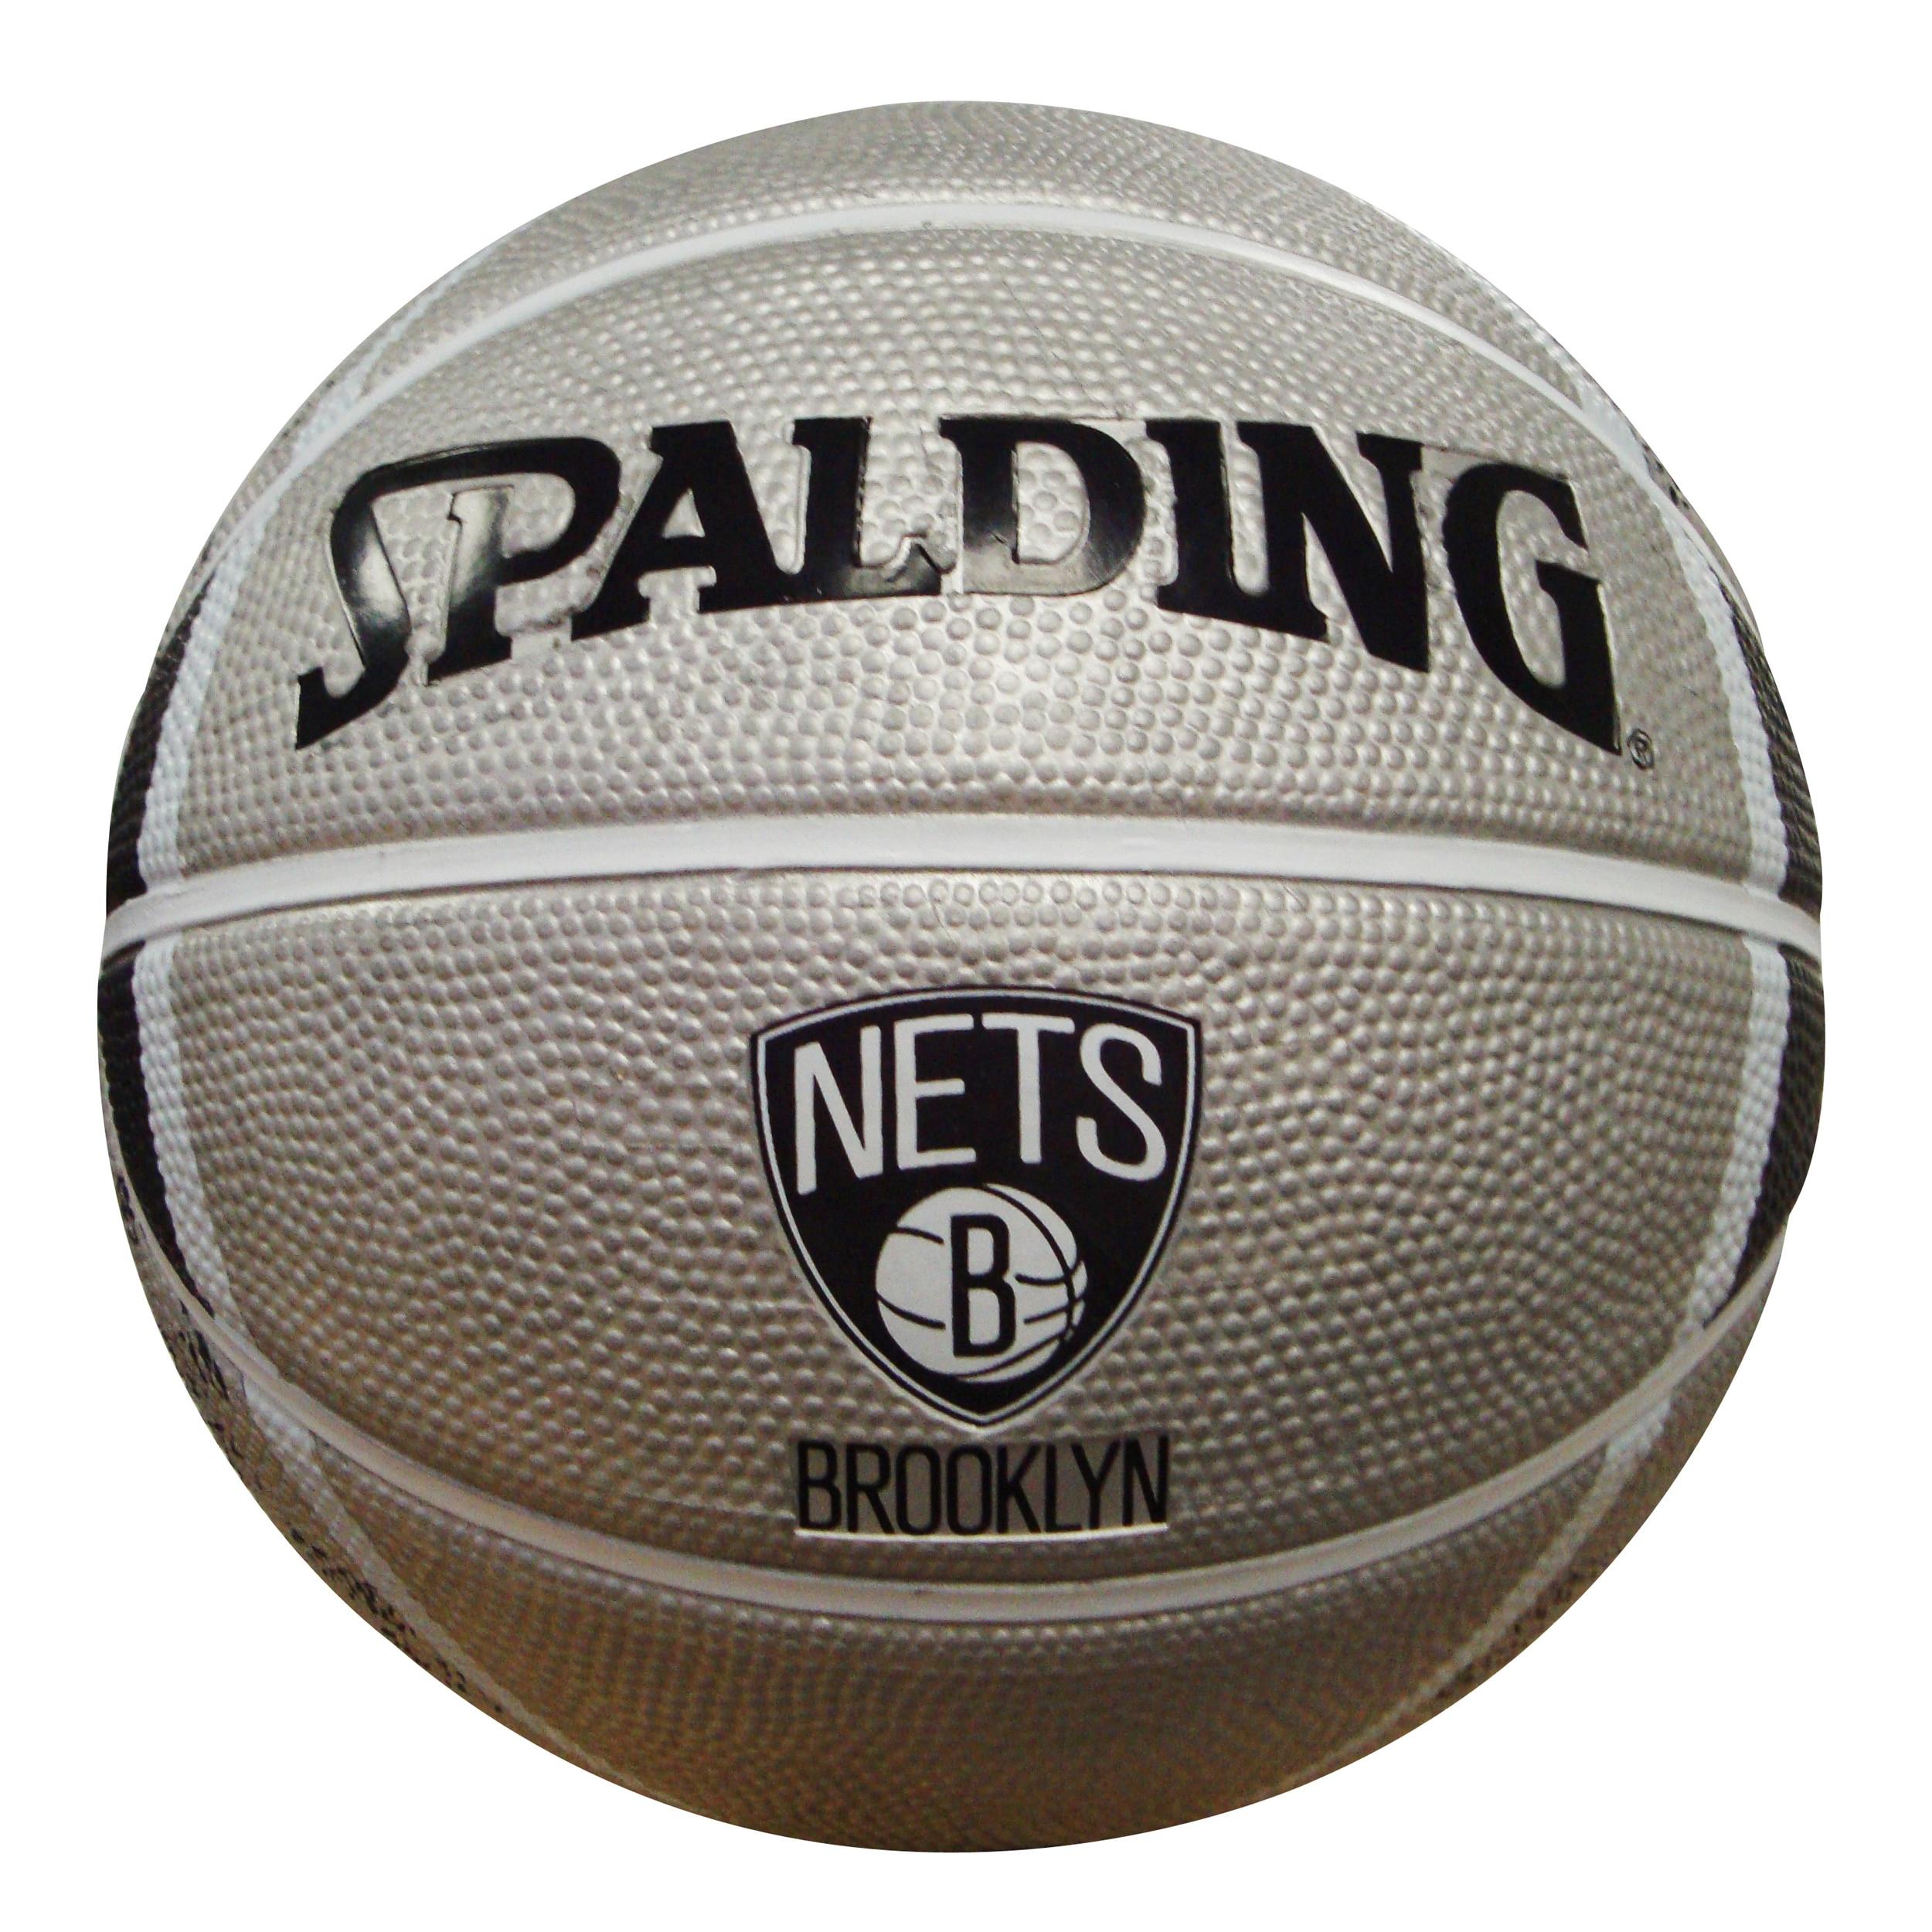 Spalding Brooklyn Nets 7-inch Mini Basketball (1)